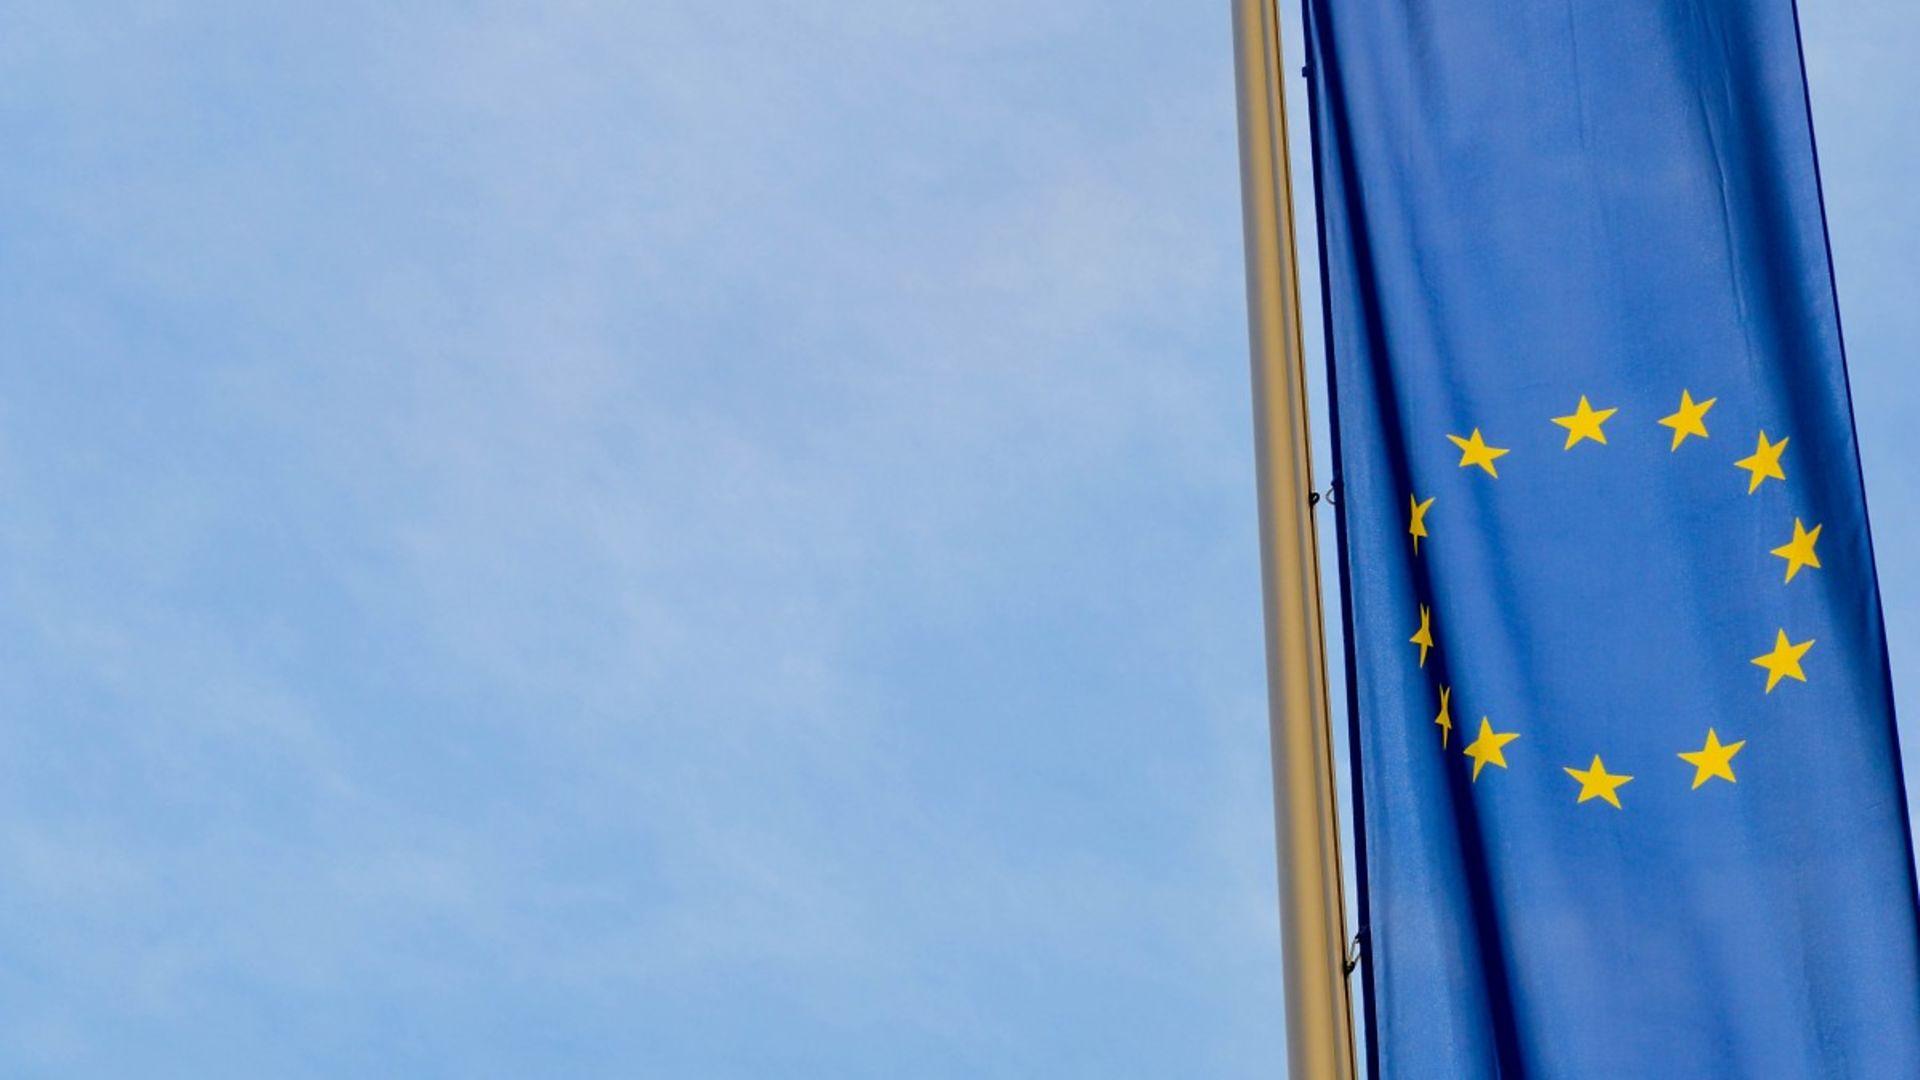 The European flag - Credit: PXHere